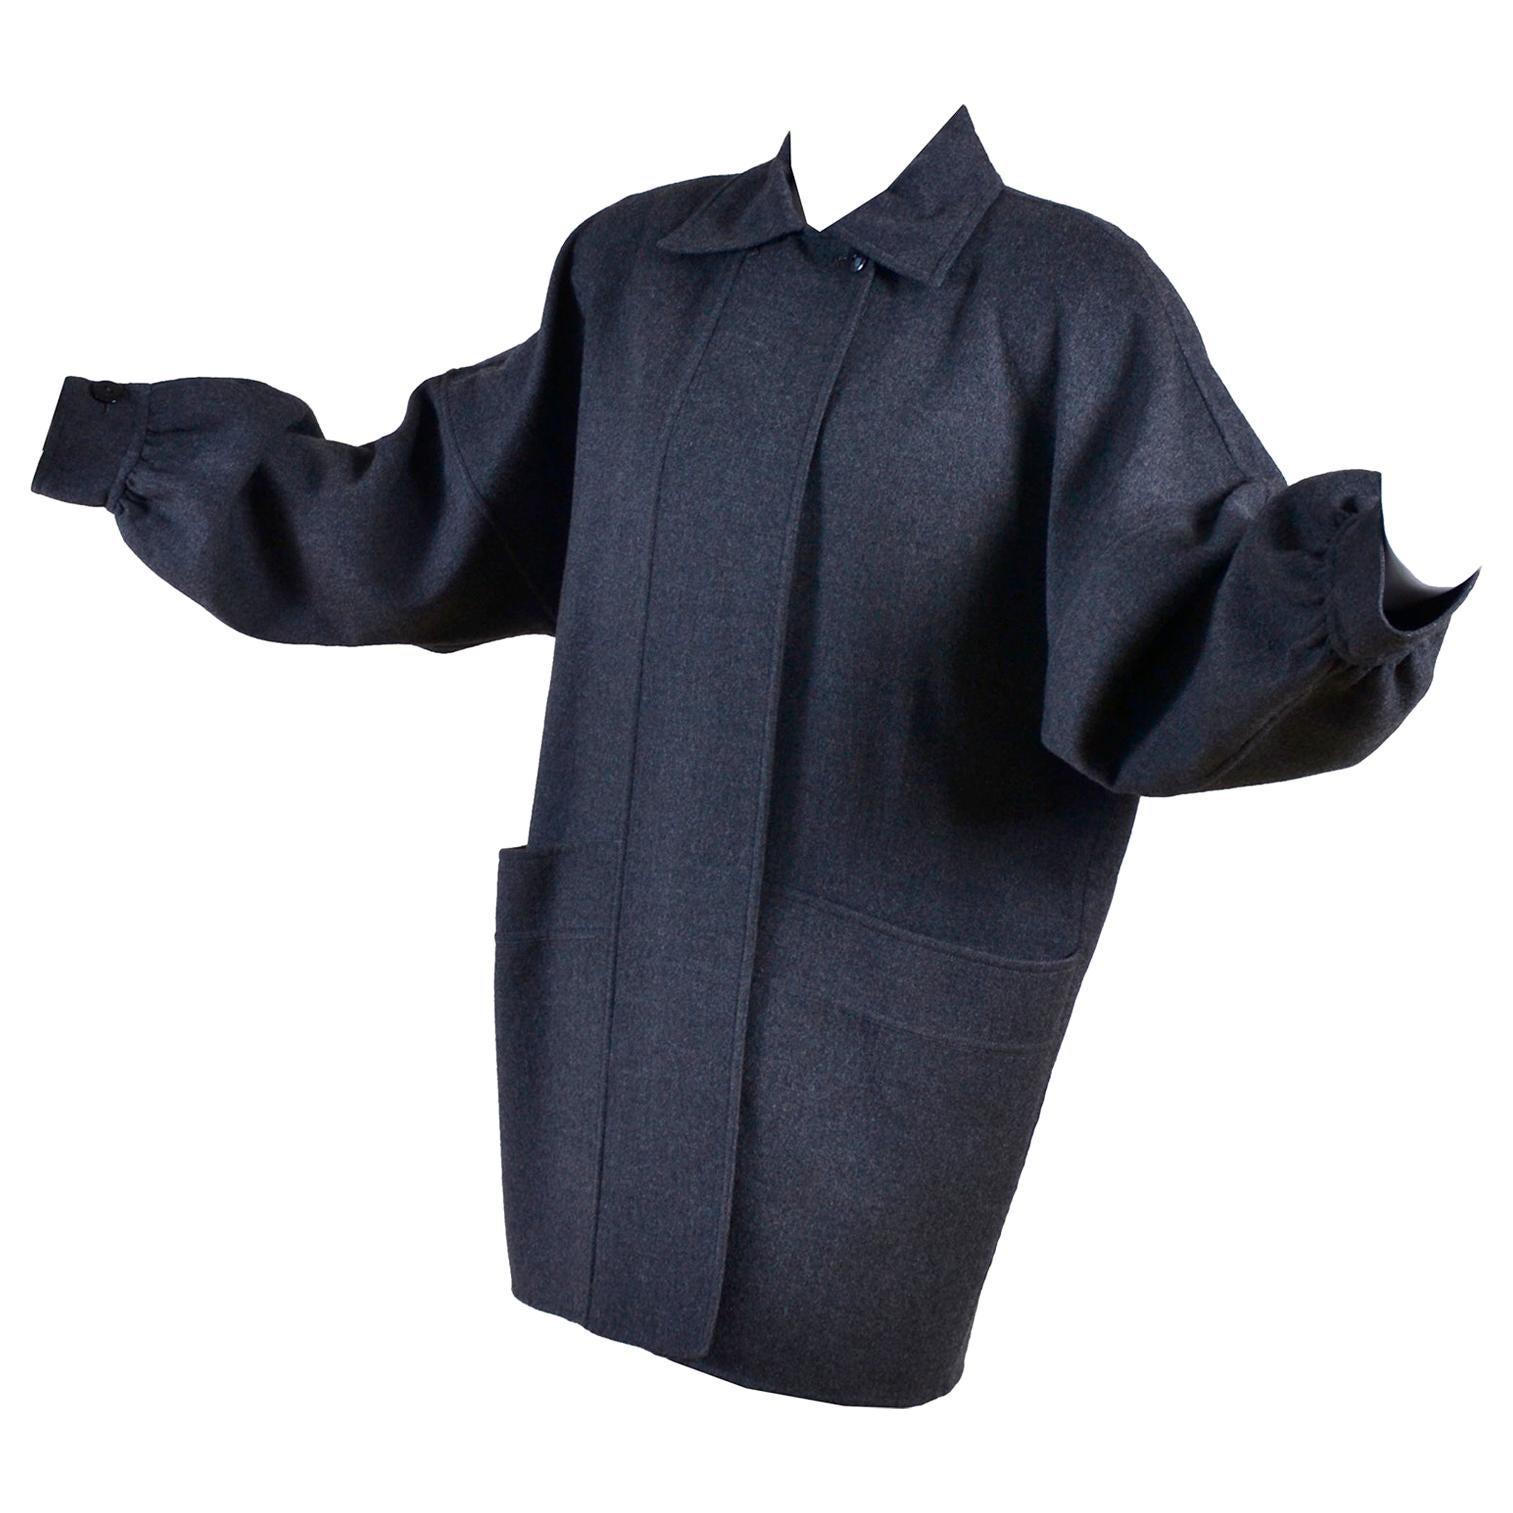 Vintage Salvatore Ferragamo Coat 1980s Oversized Gray Wool Jacket W Pockets